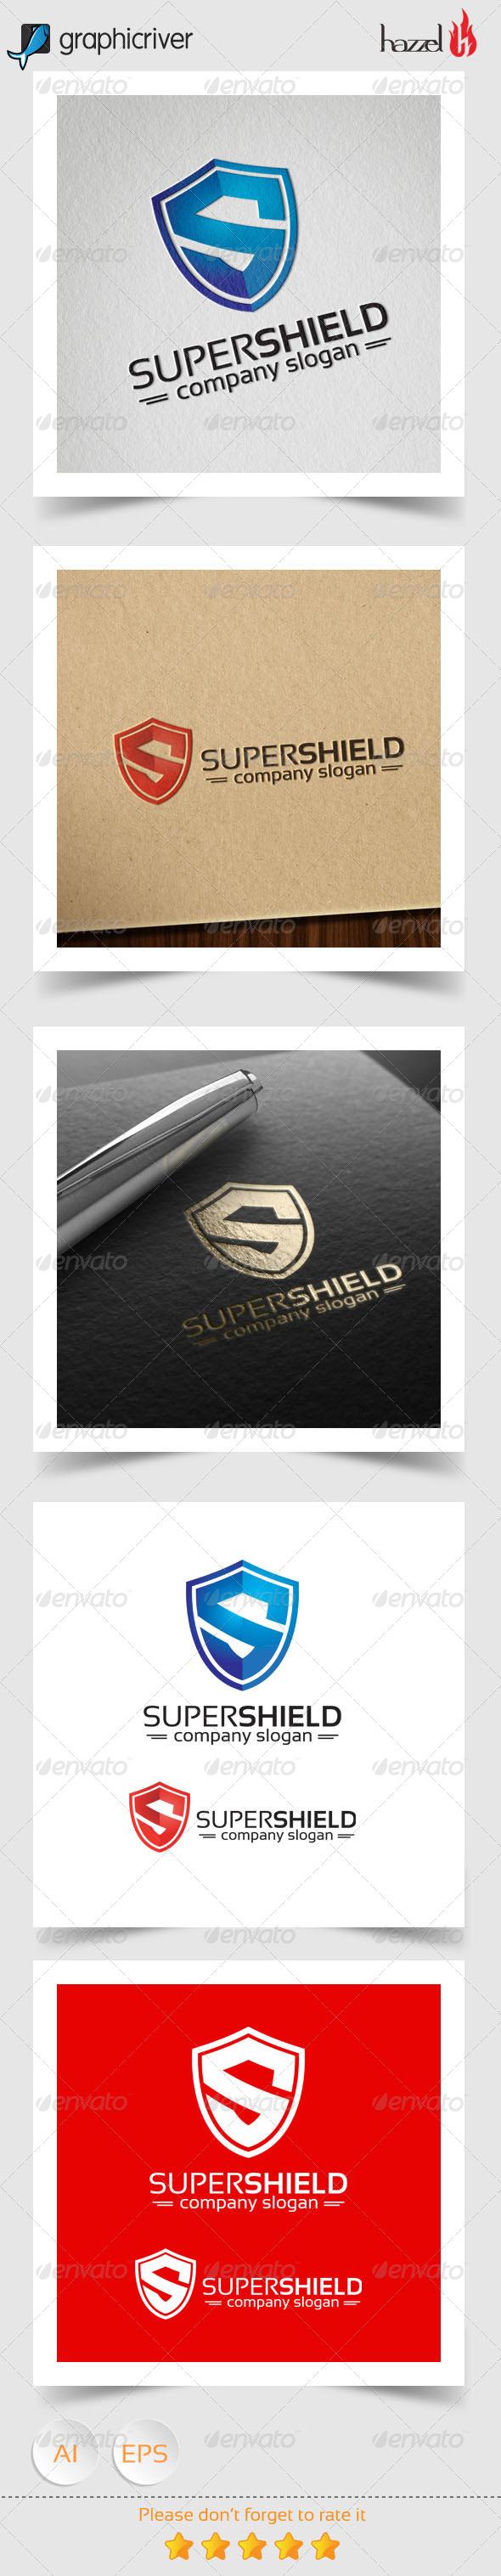 Super Shield - Letter S Logo